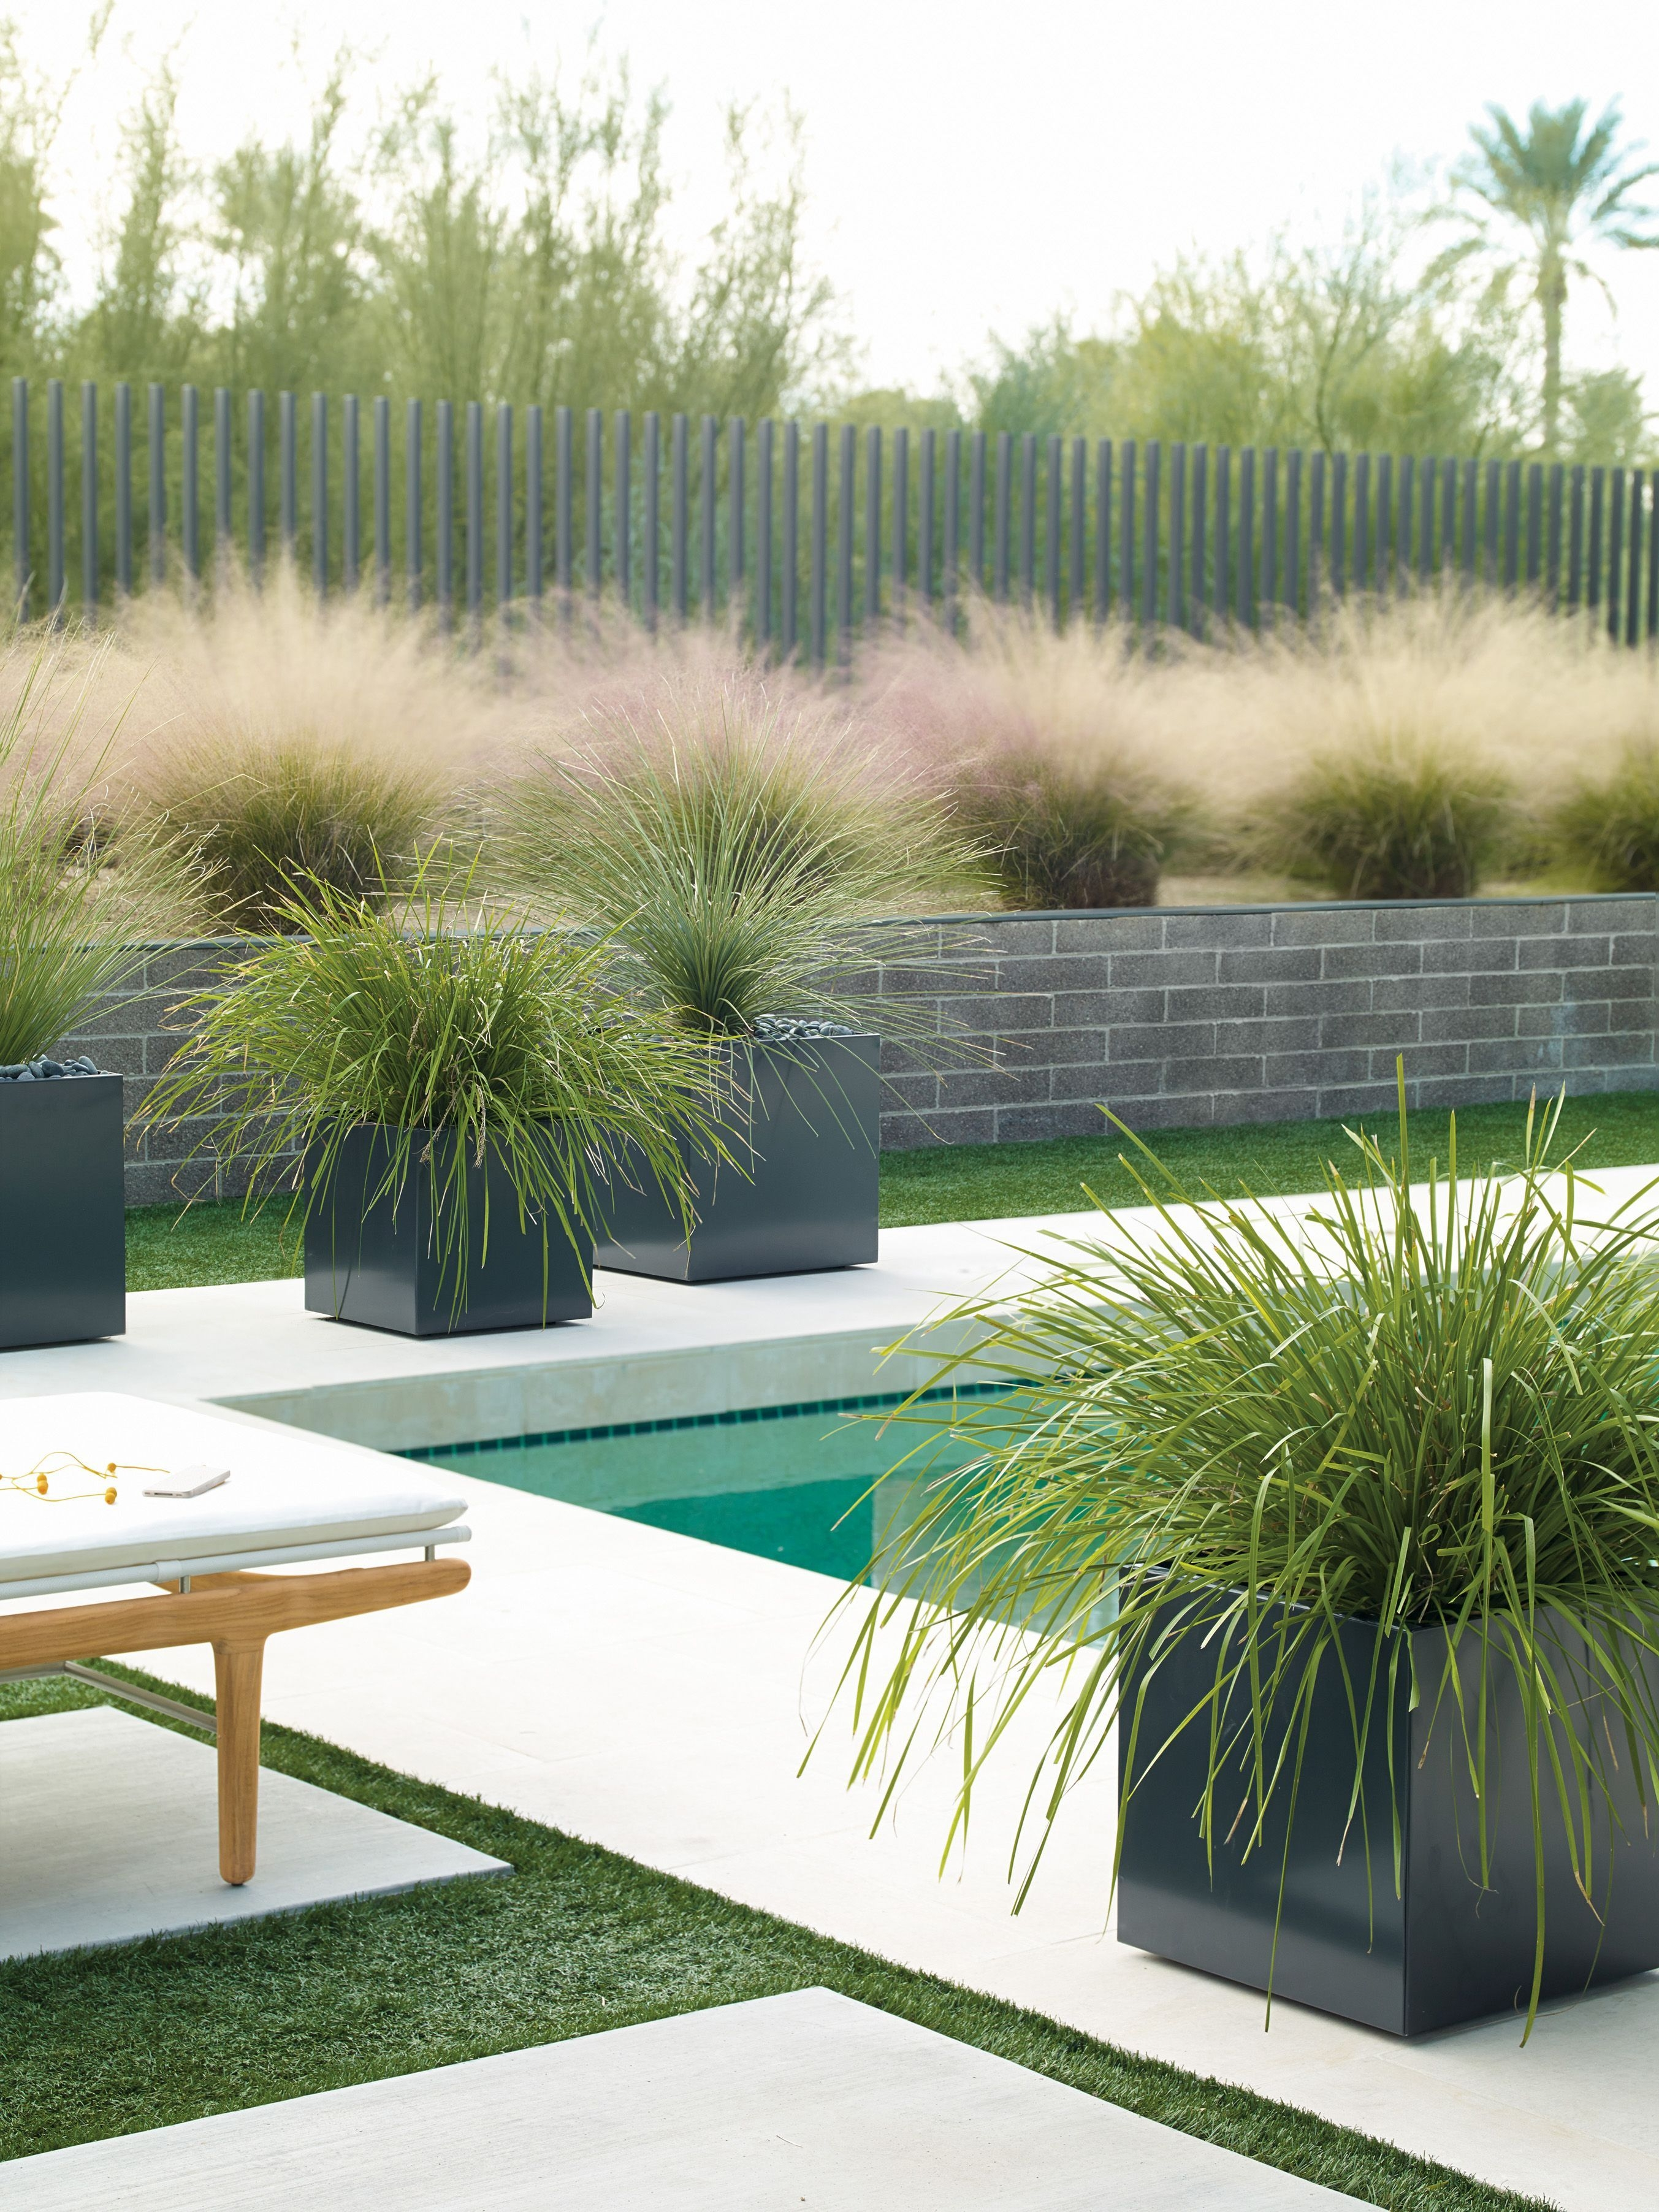 Cozy Decorative Garden Planters Design Ideas 19